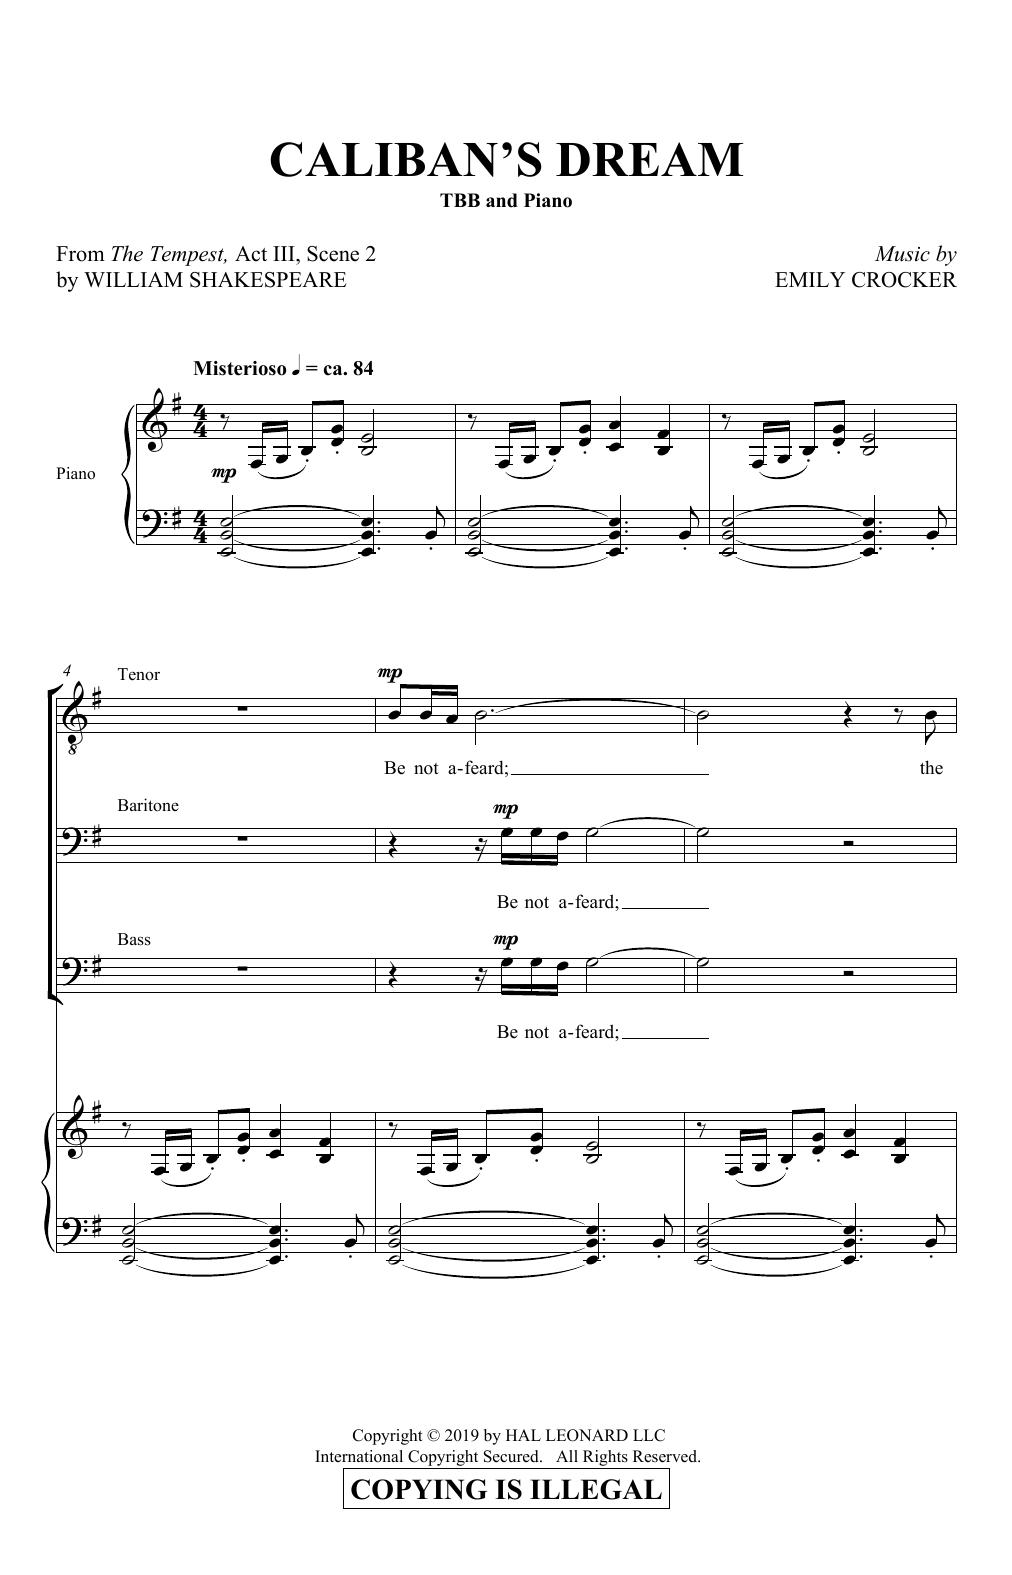 Emily Crocker Caliban's Dream sheet music notes and chords. Download Printable PDF.